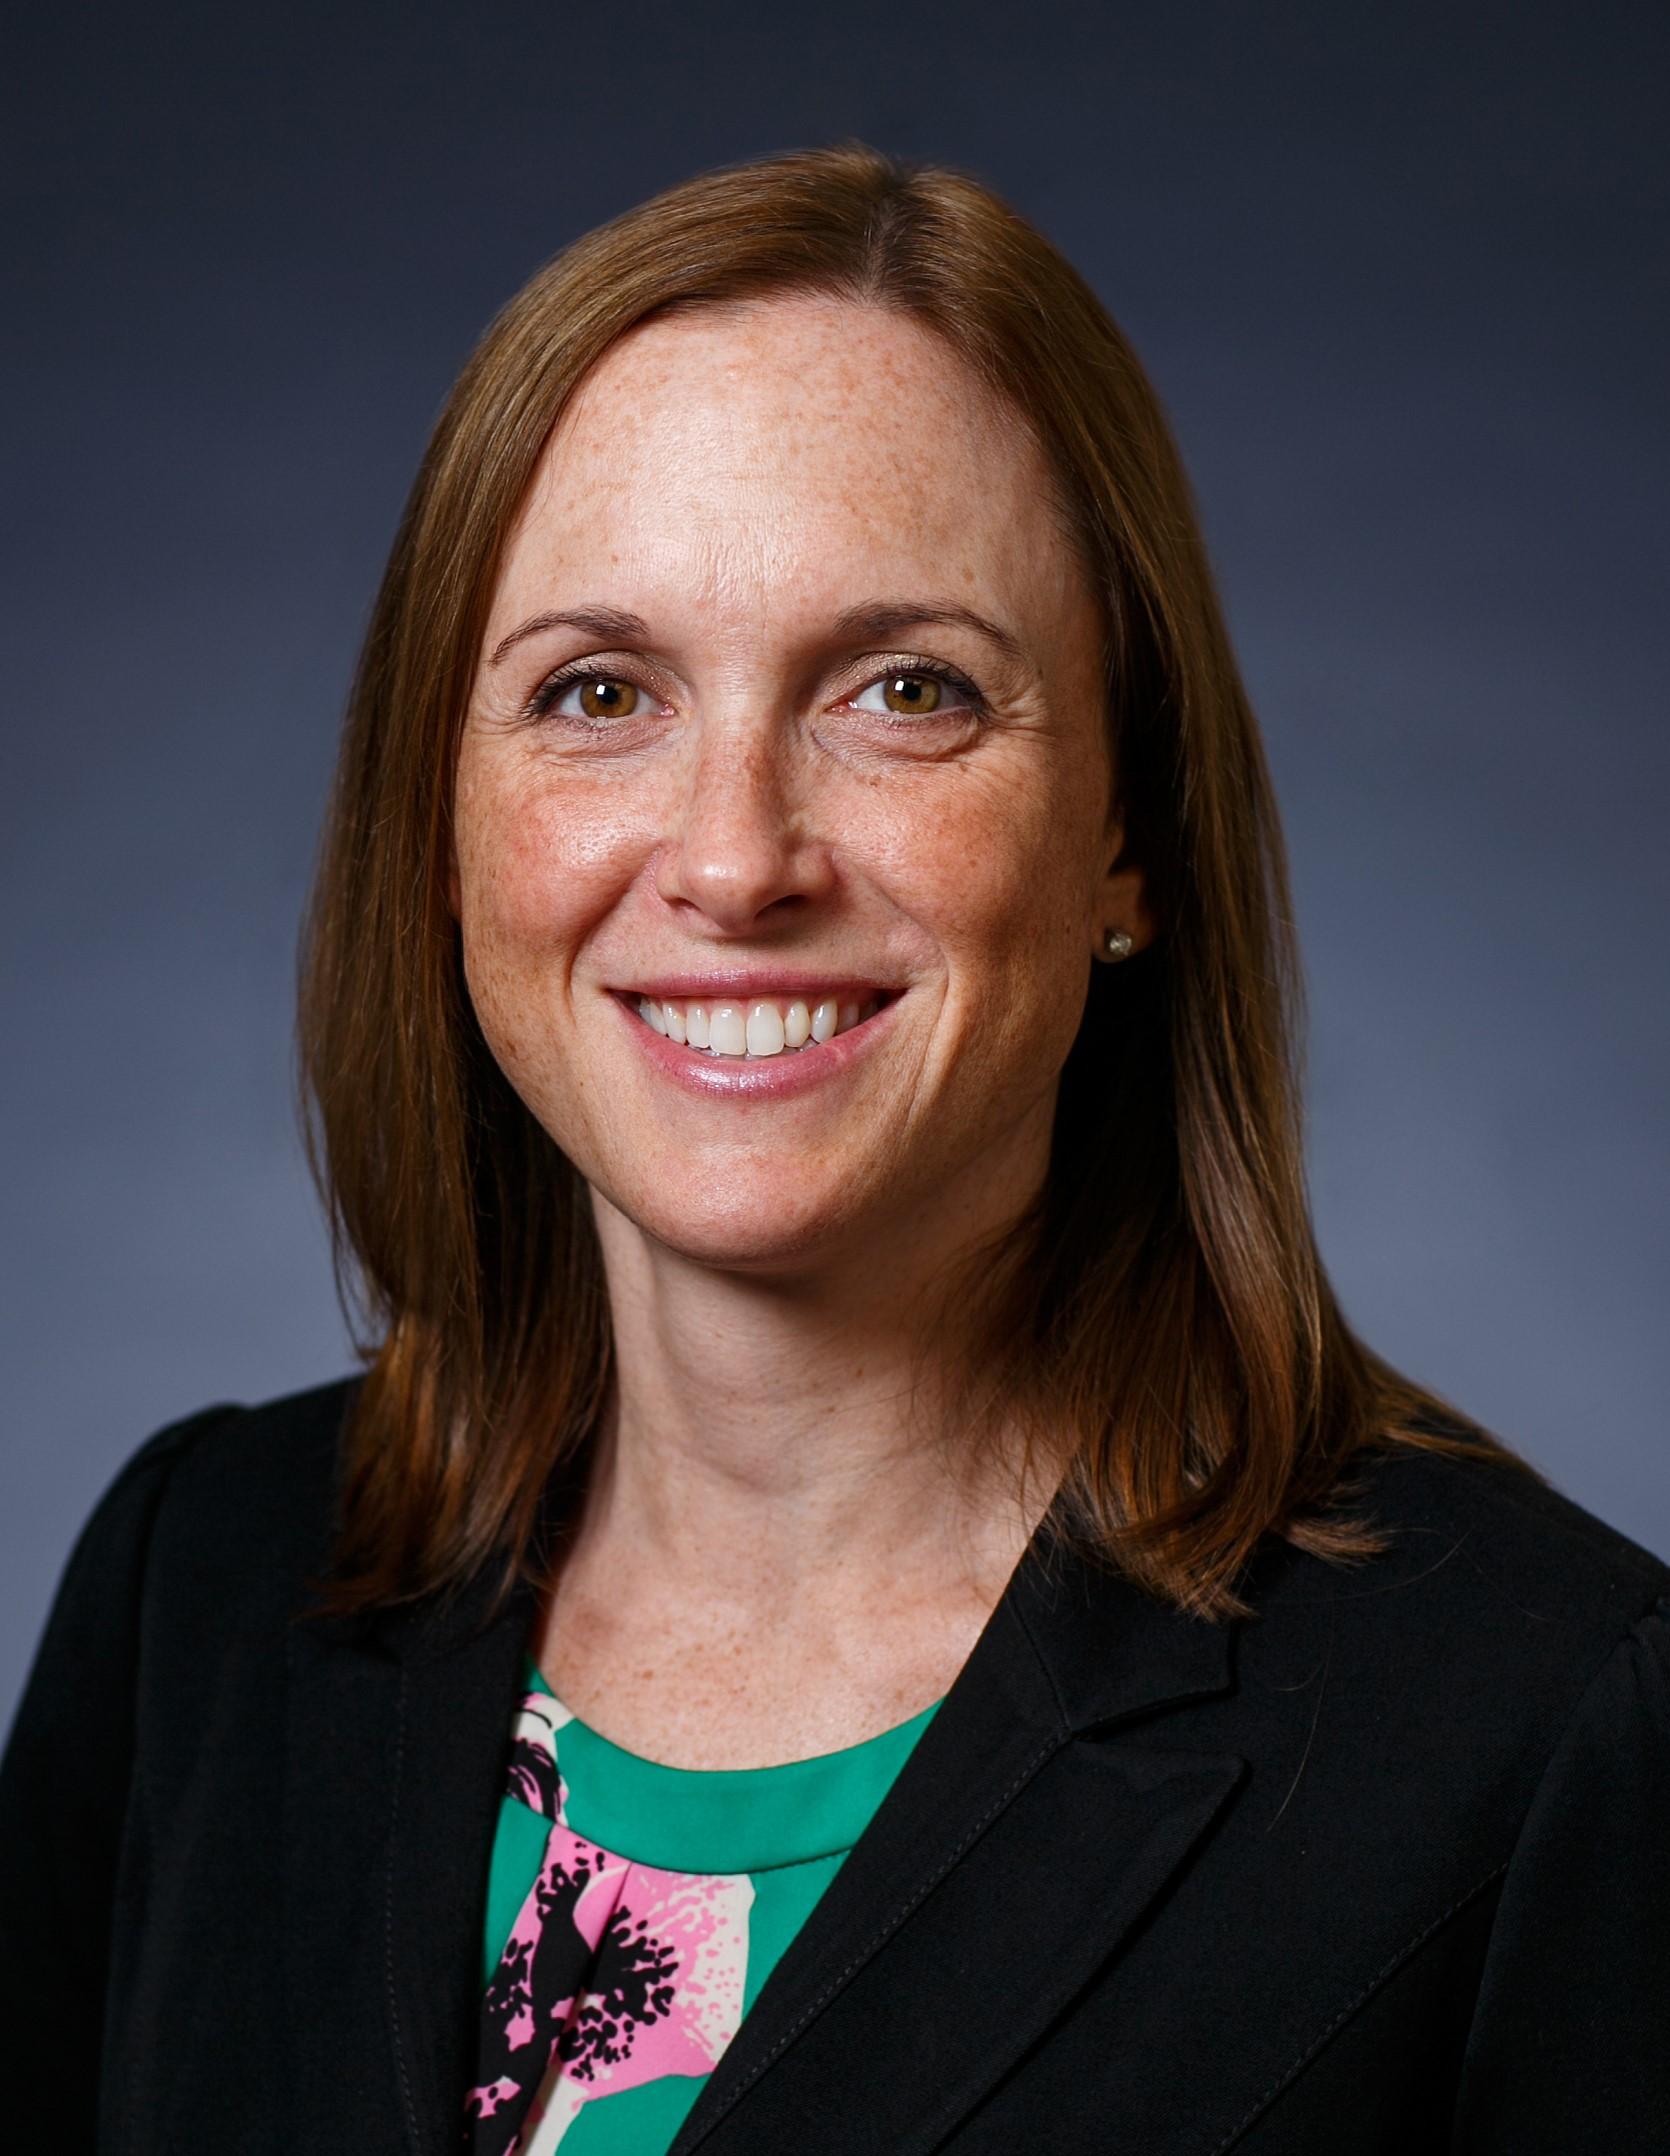 Megan Senkowski, CPA, Passes the AICPA Advanced Defined Contribution Plan Audit Certificate Exam